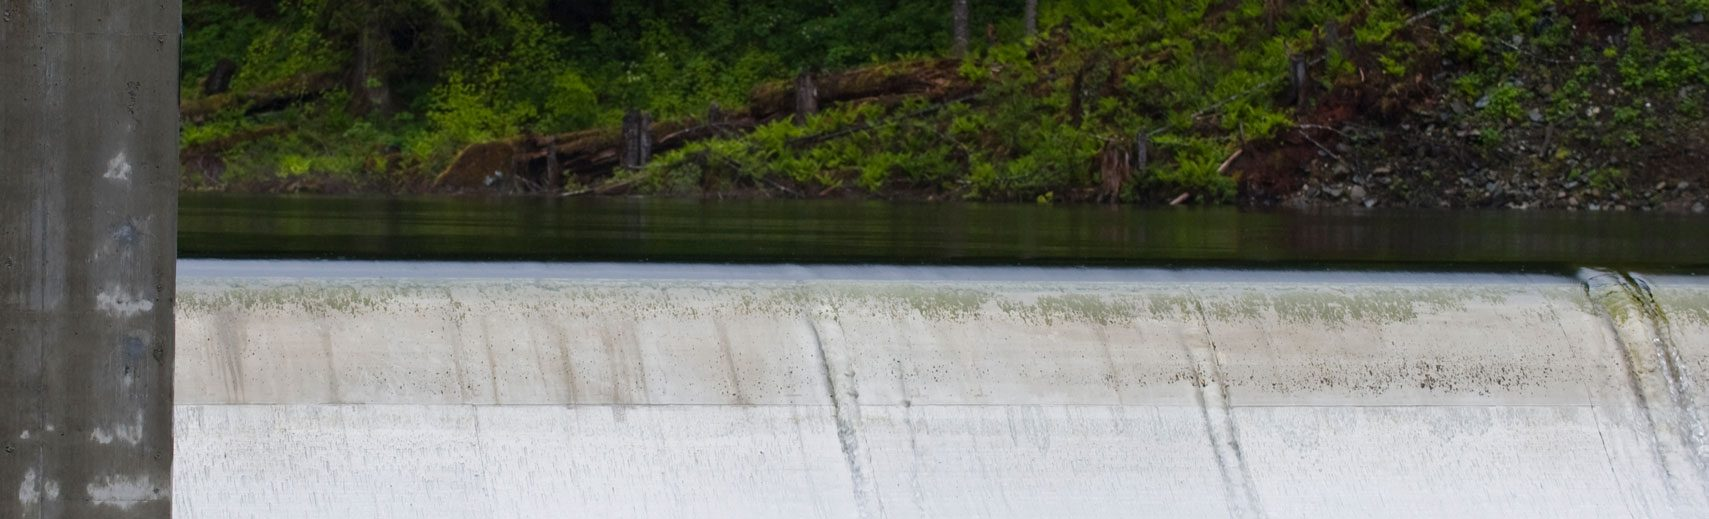 Douglas Creek - Sites - Innergex